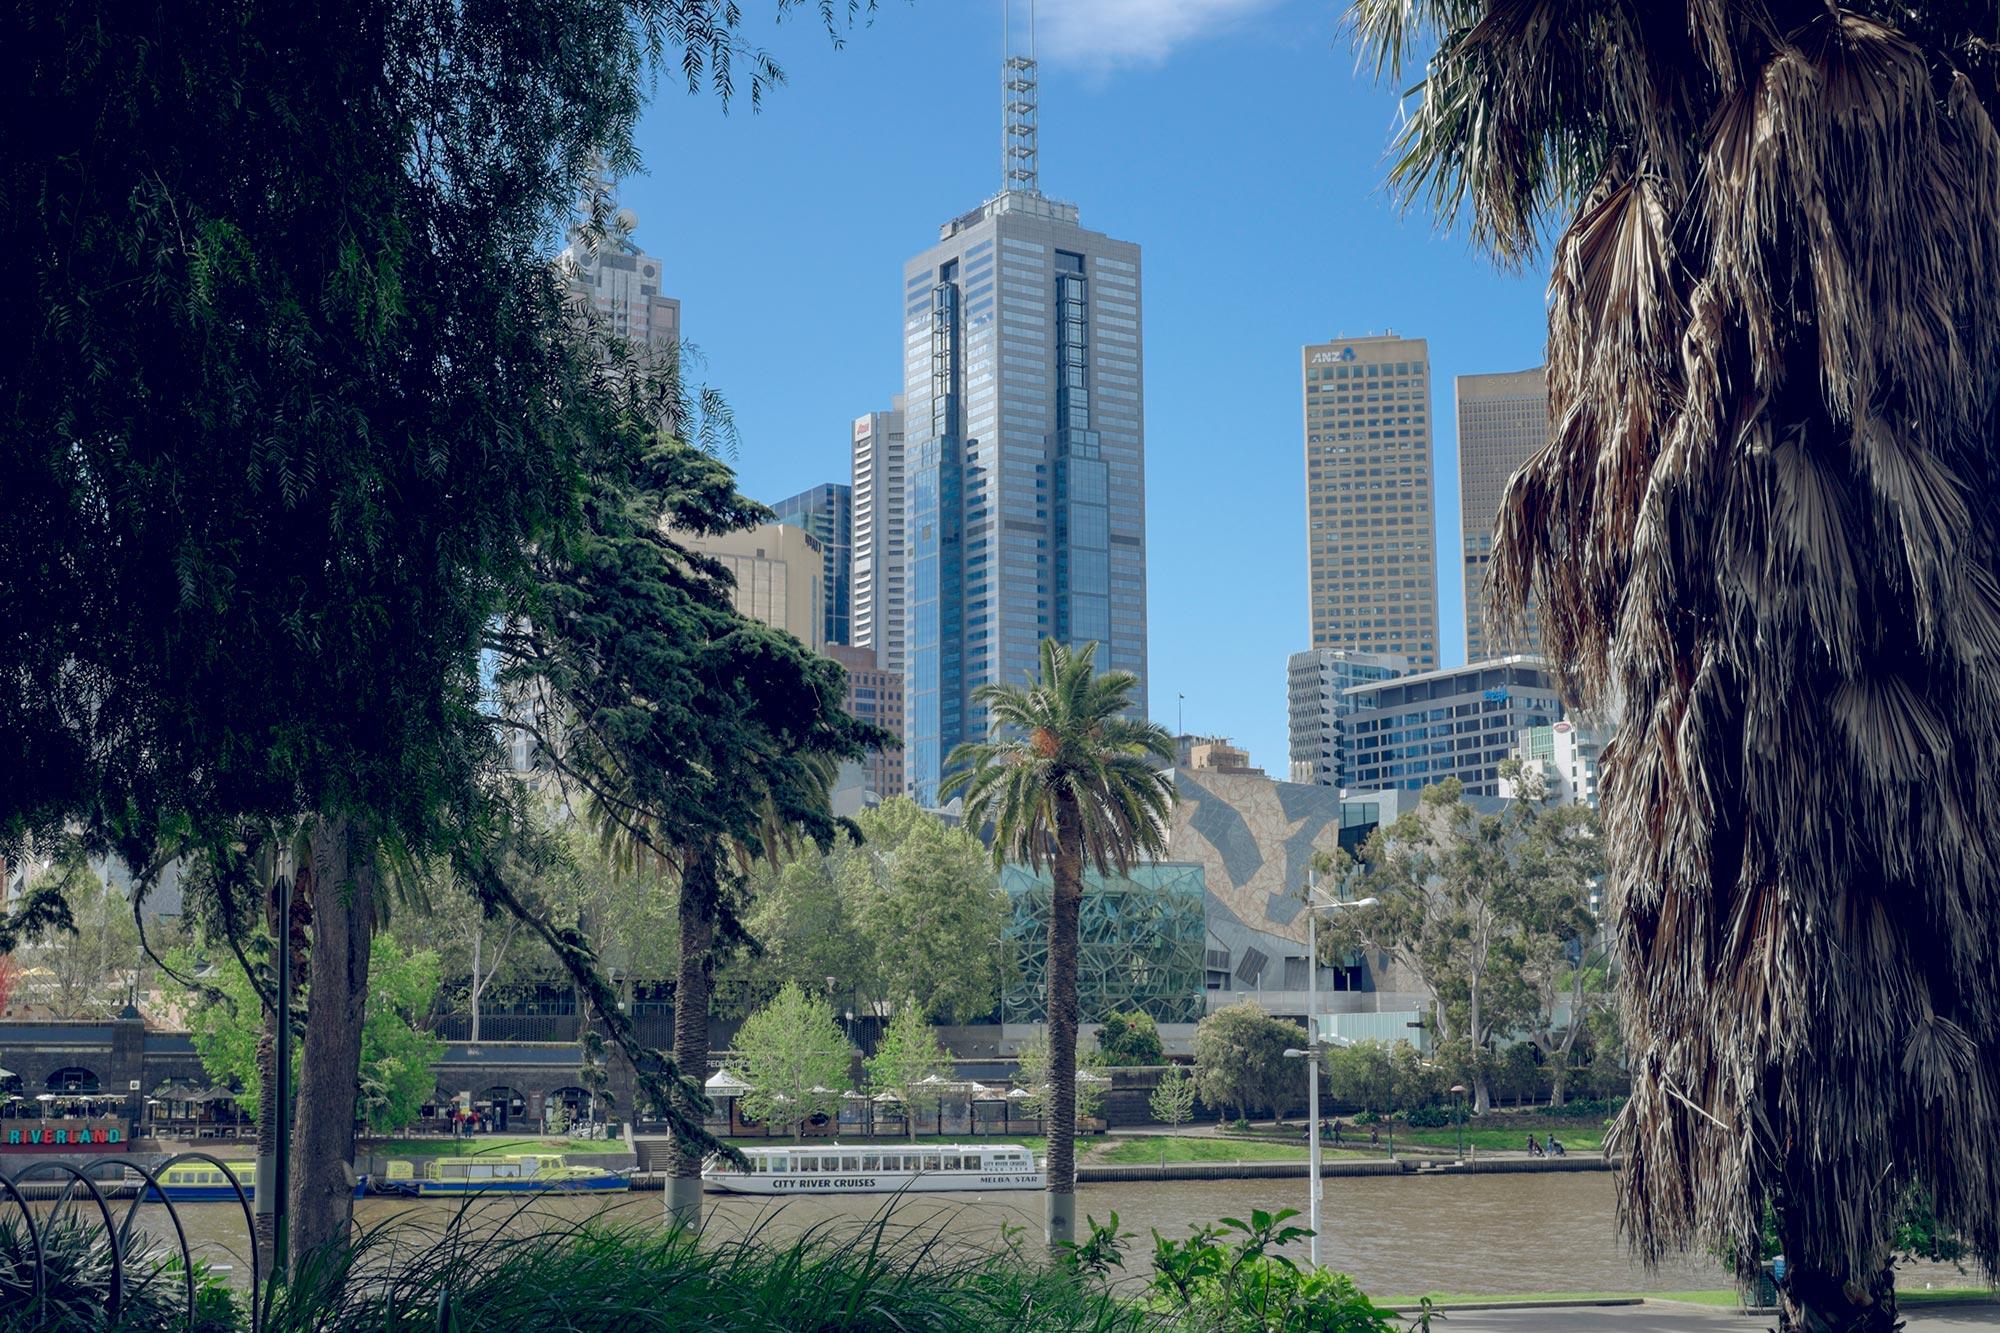 australia-melbourne-yarra-river5